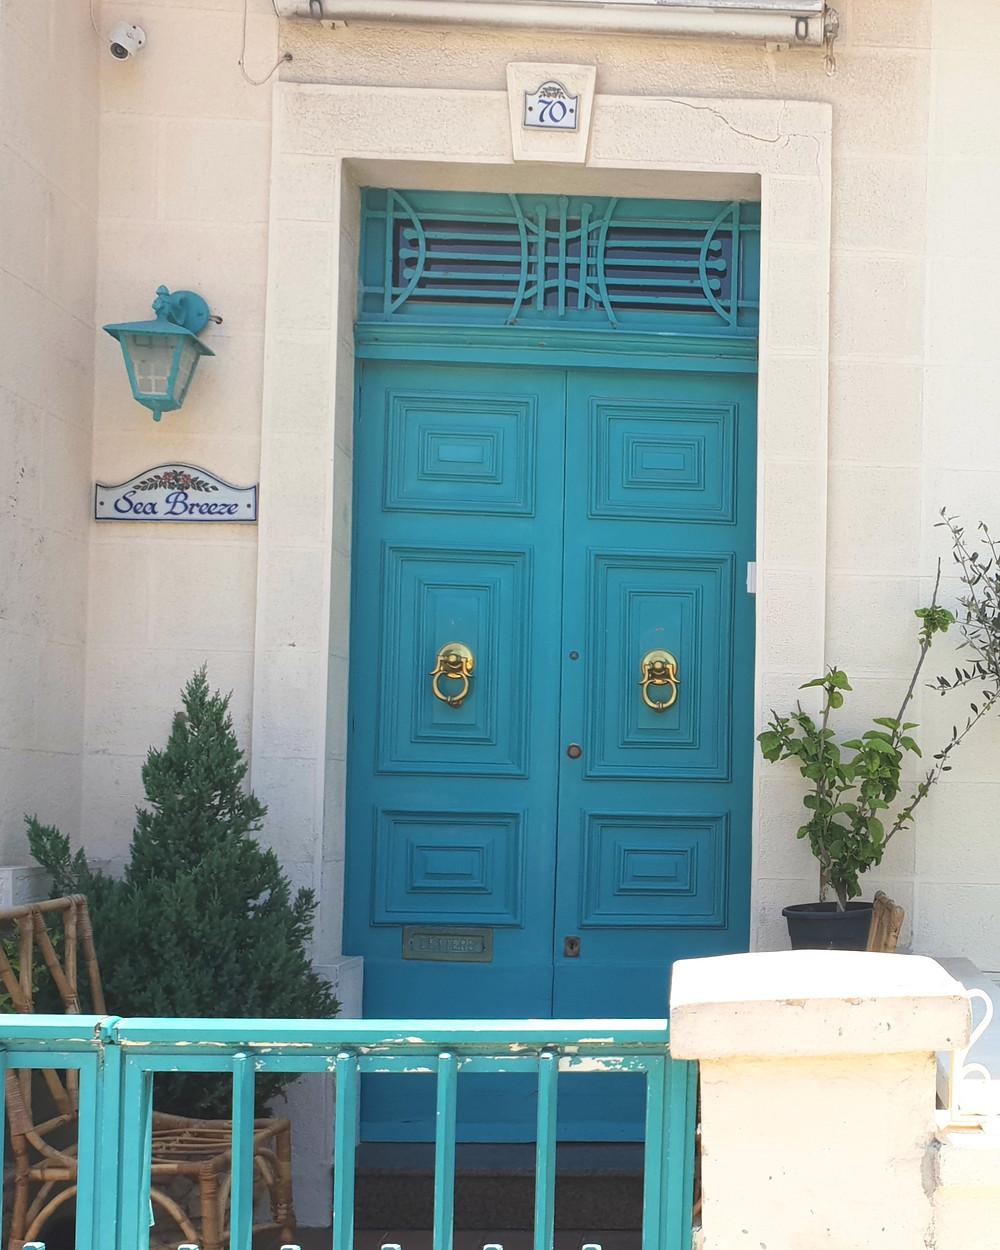 Malta holiday turquoise door